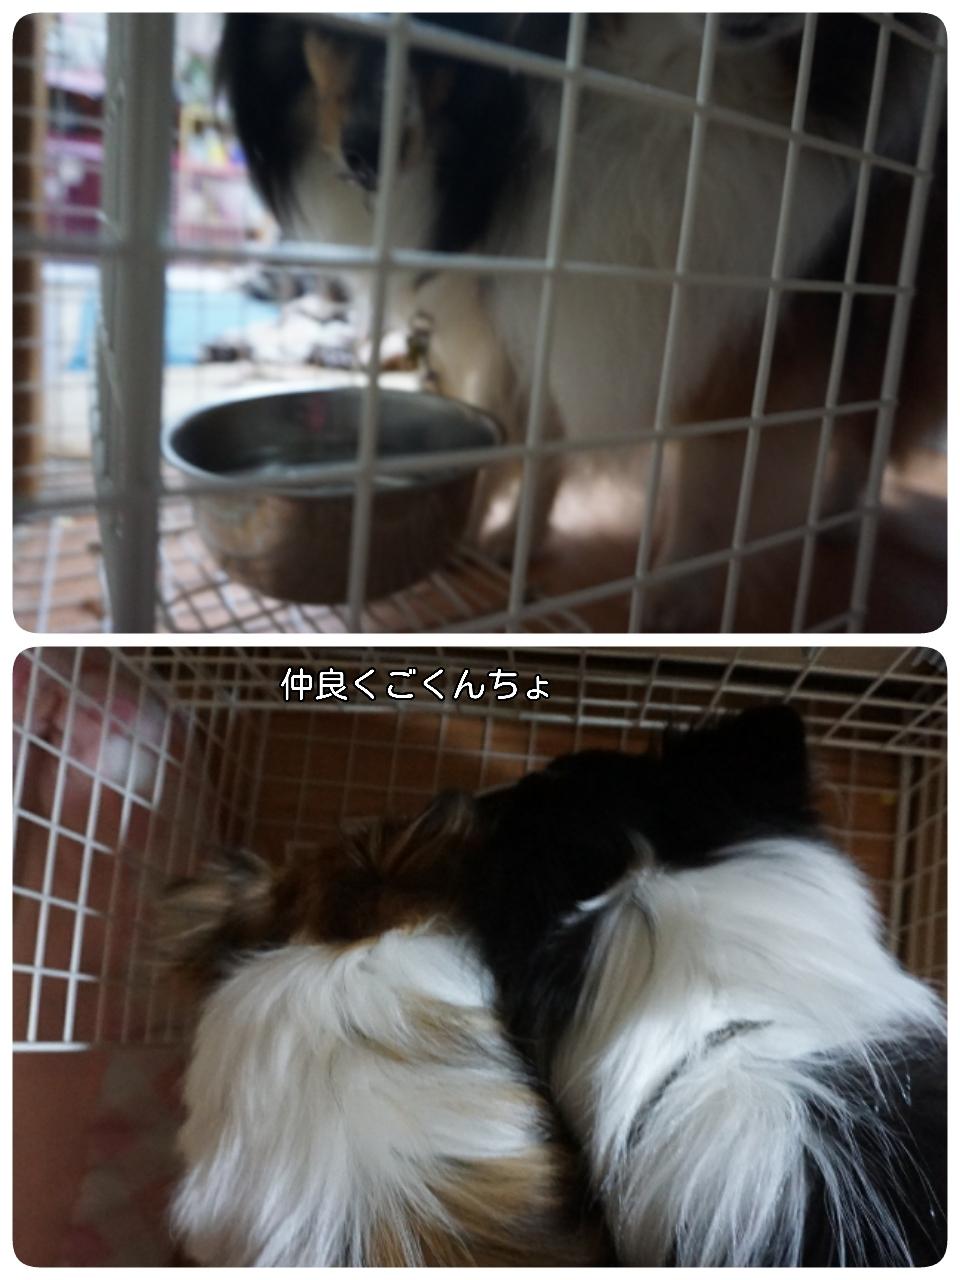 17-02-09-15-09-04-890_deco.jpg